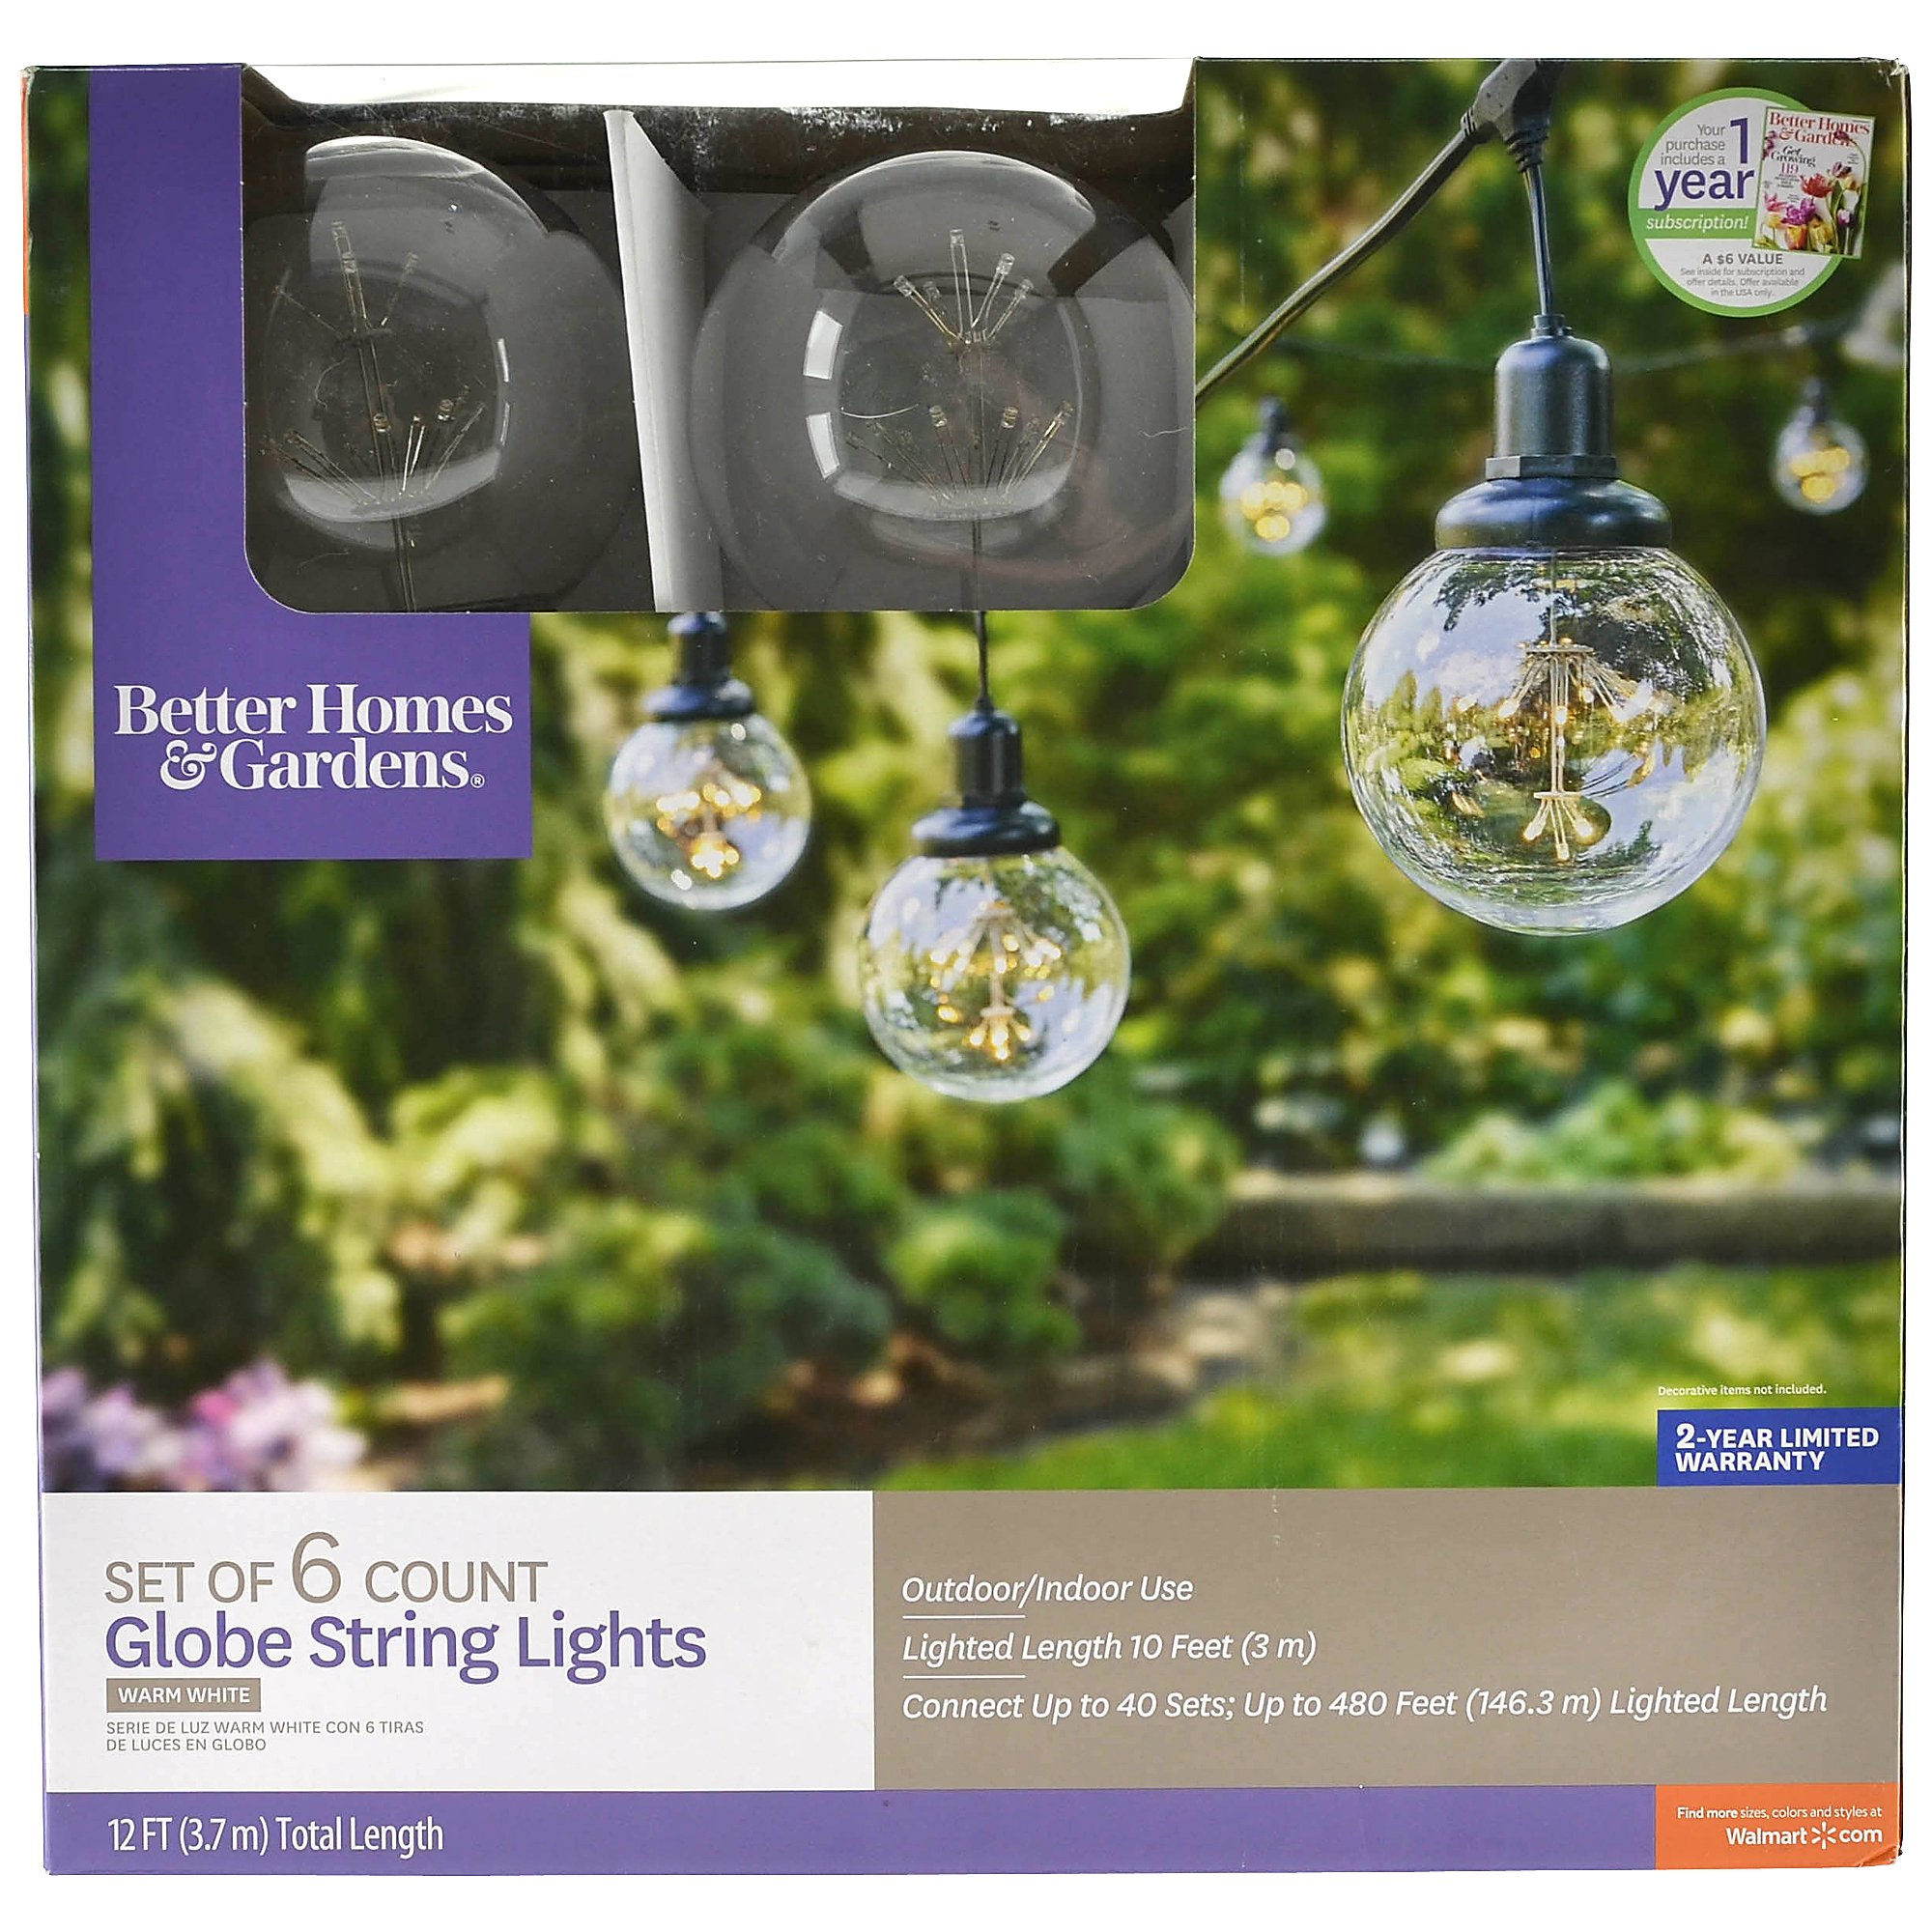 Better Homes & Gardens 22ft Outdoor LED Cafe String Lights